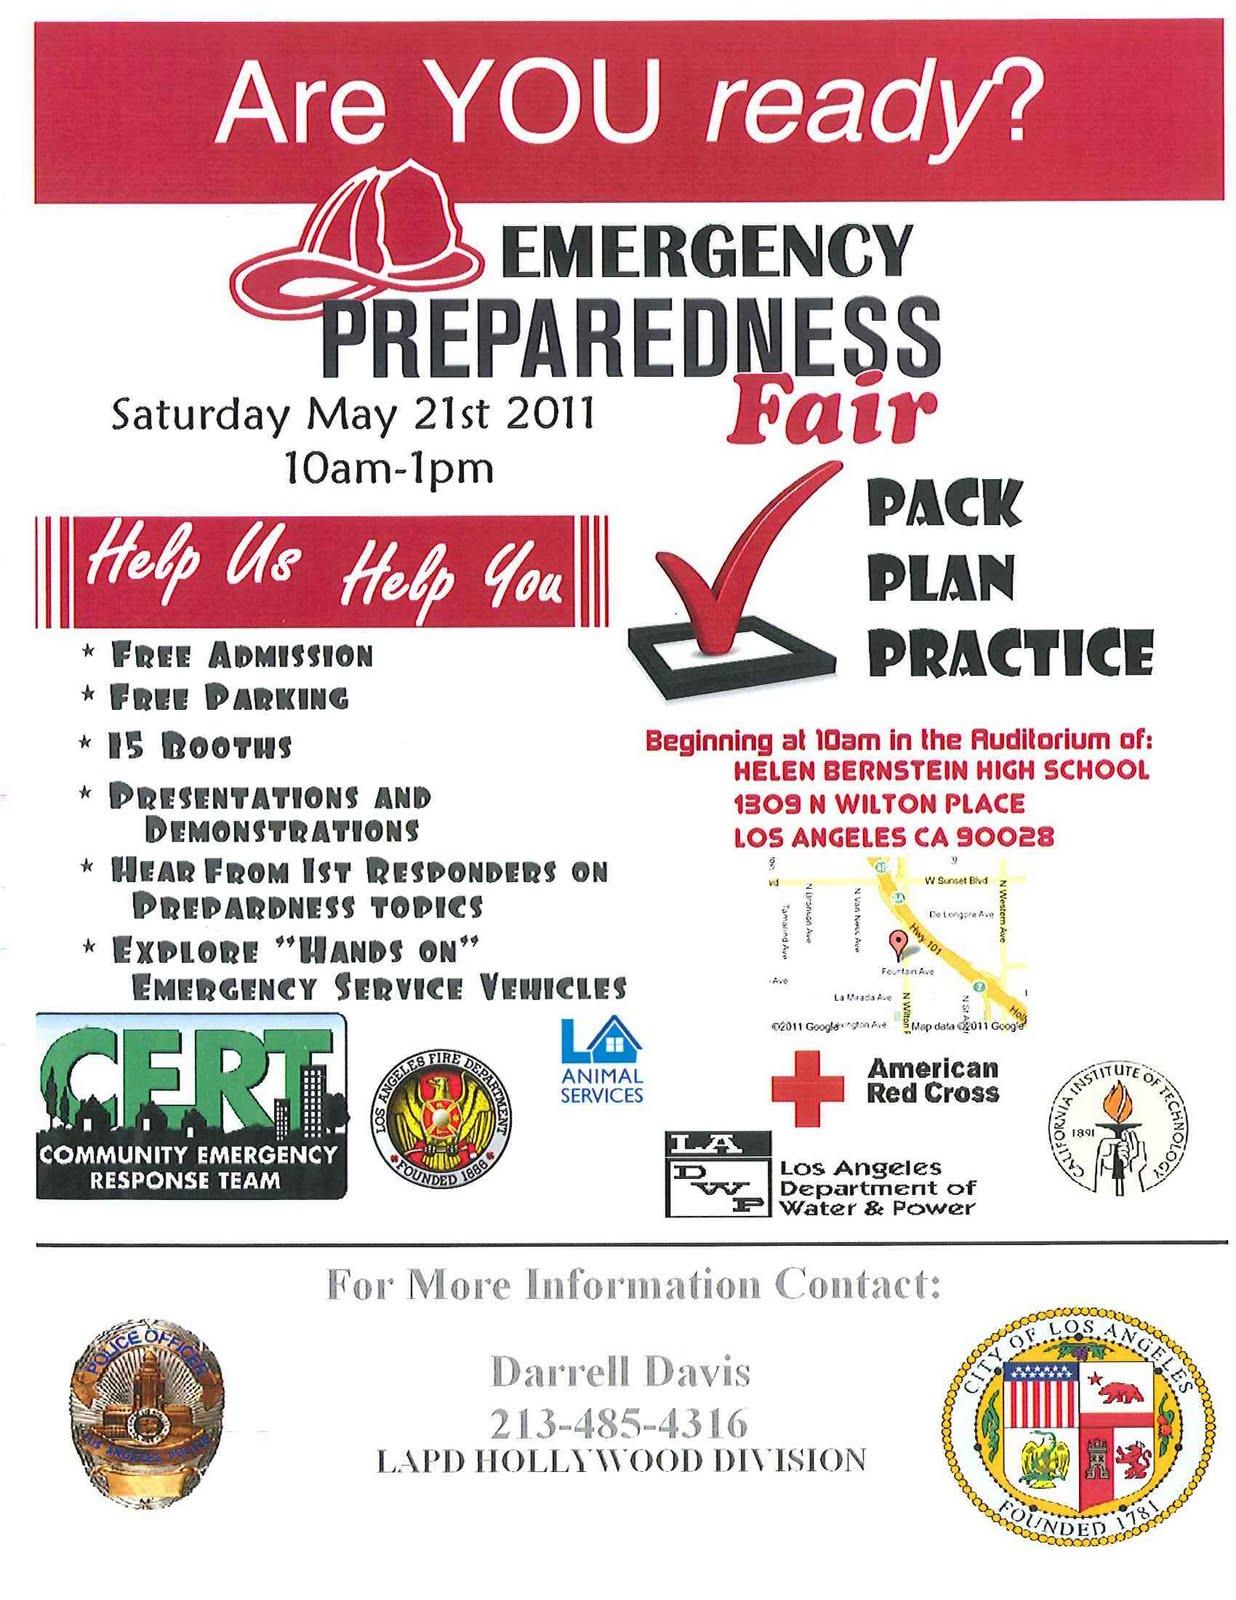 lacityorgcd13: Emergency Preparedness Fair this weekend